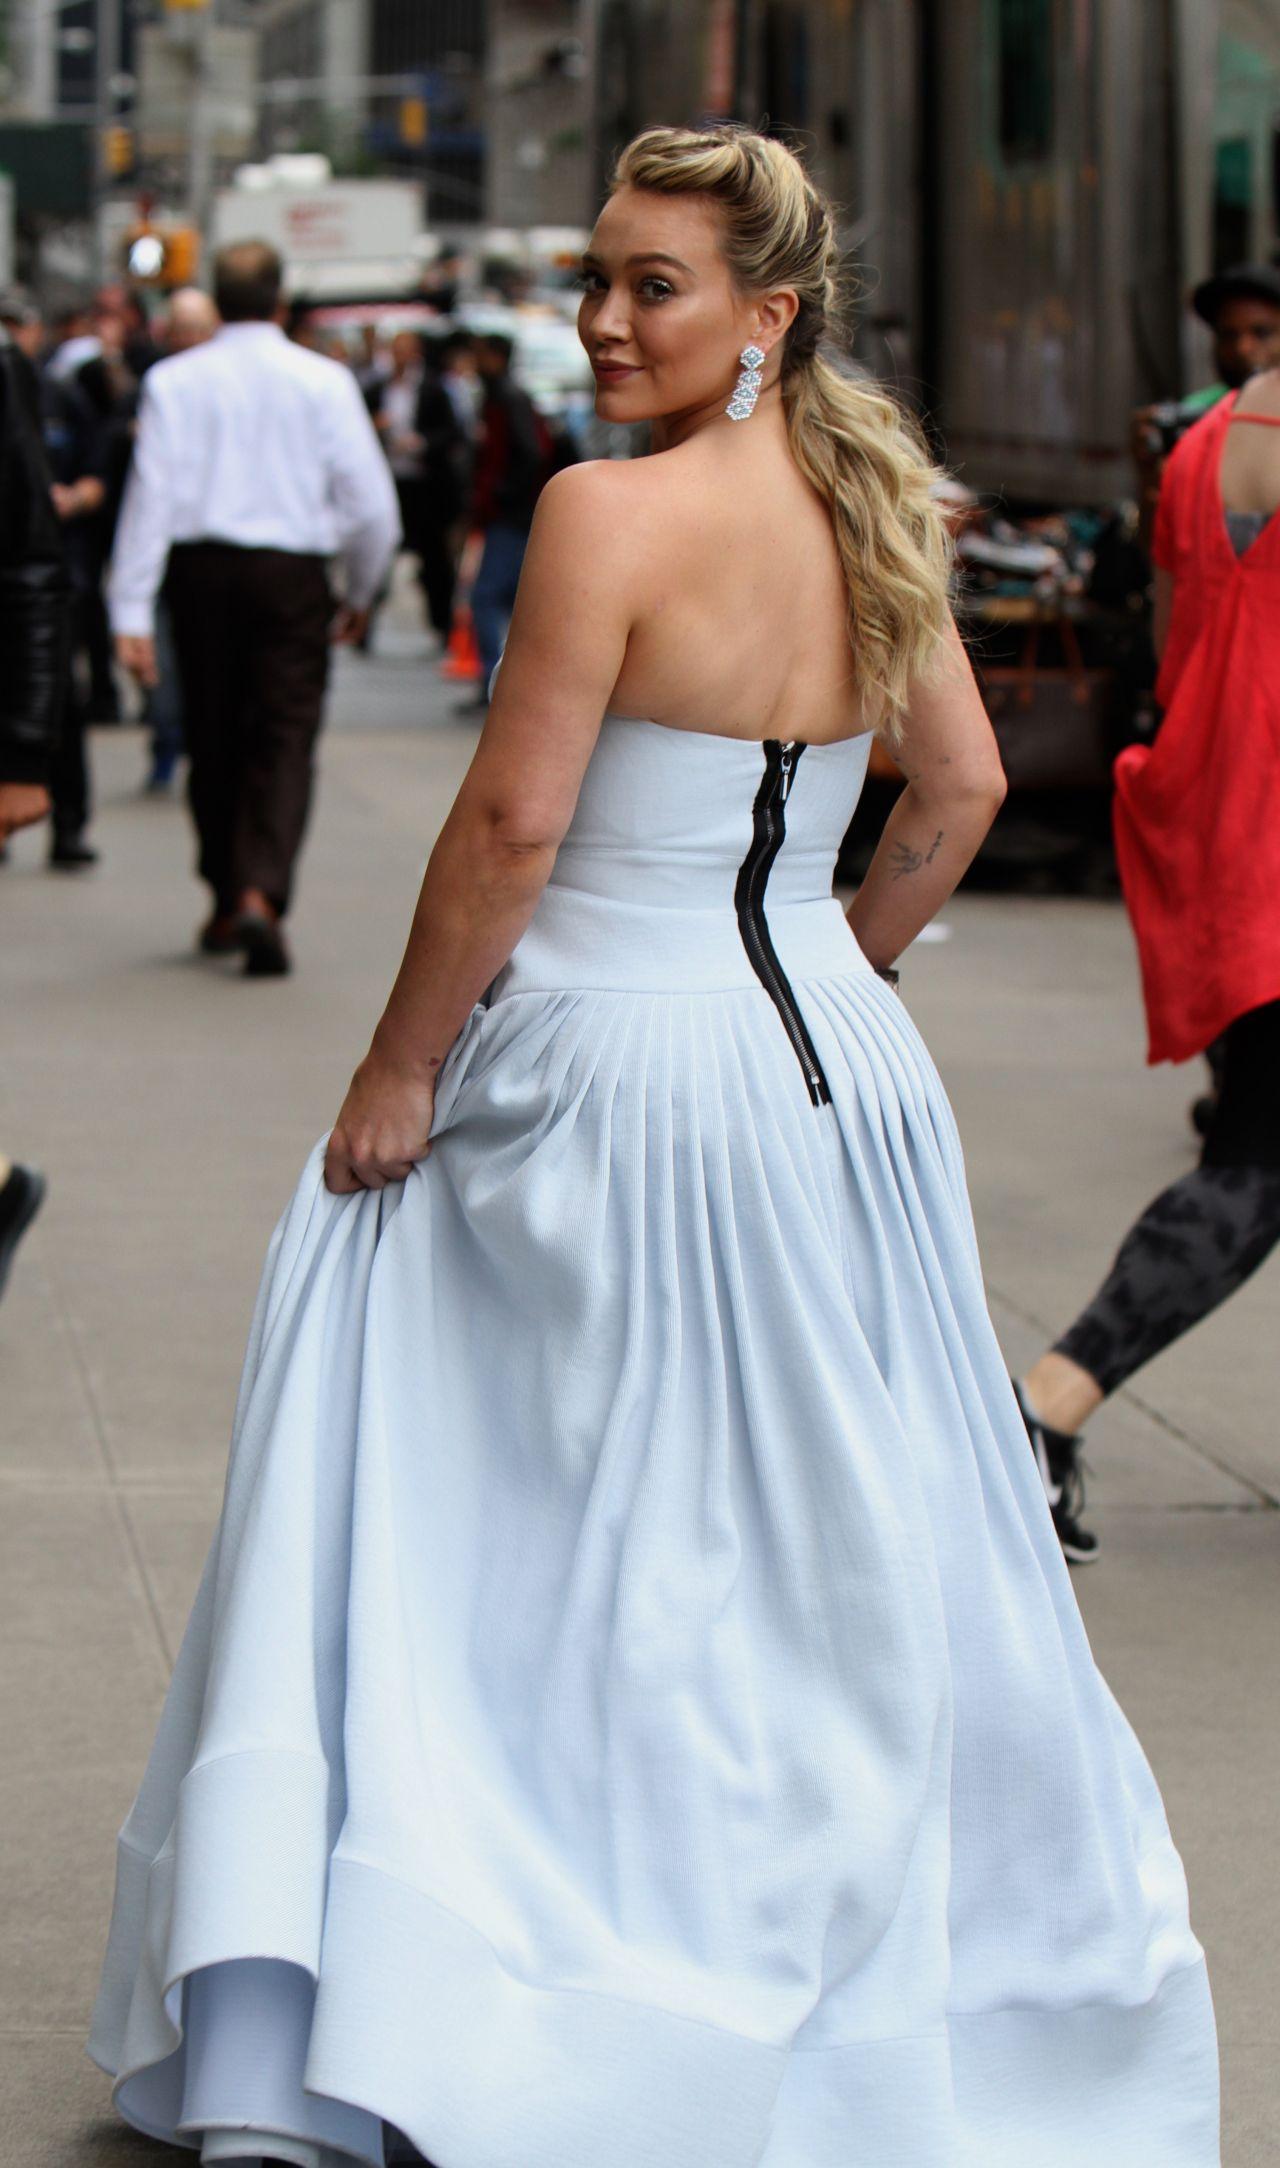 Blue dress hilary duff